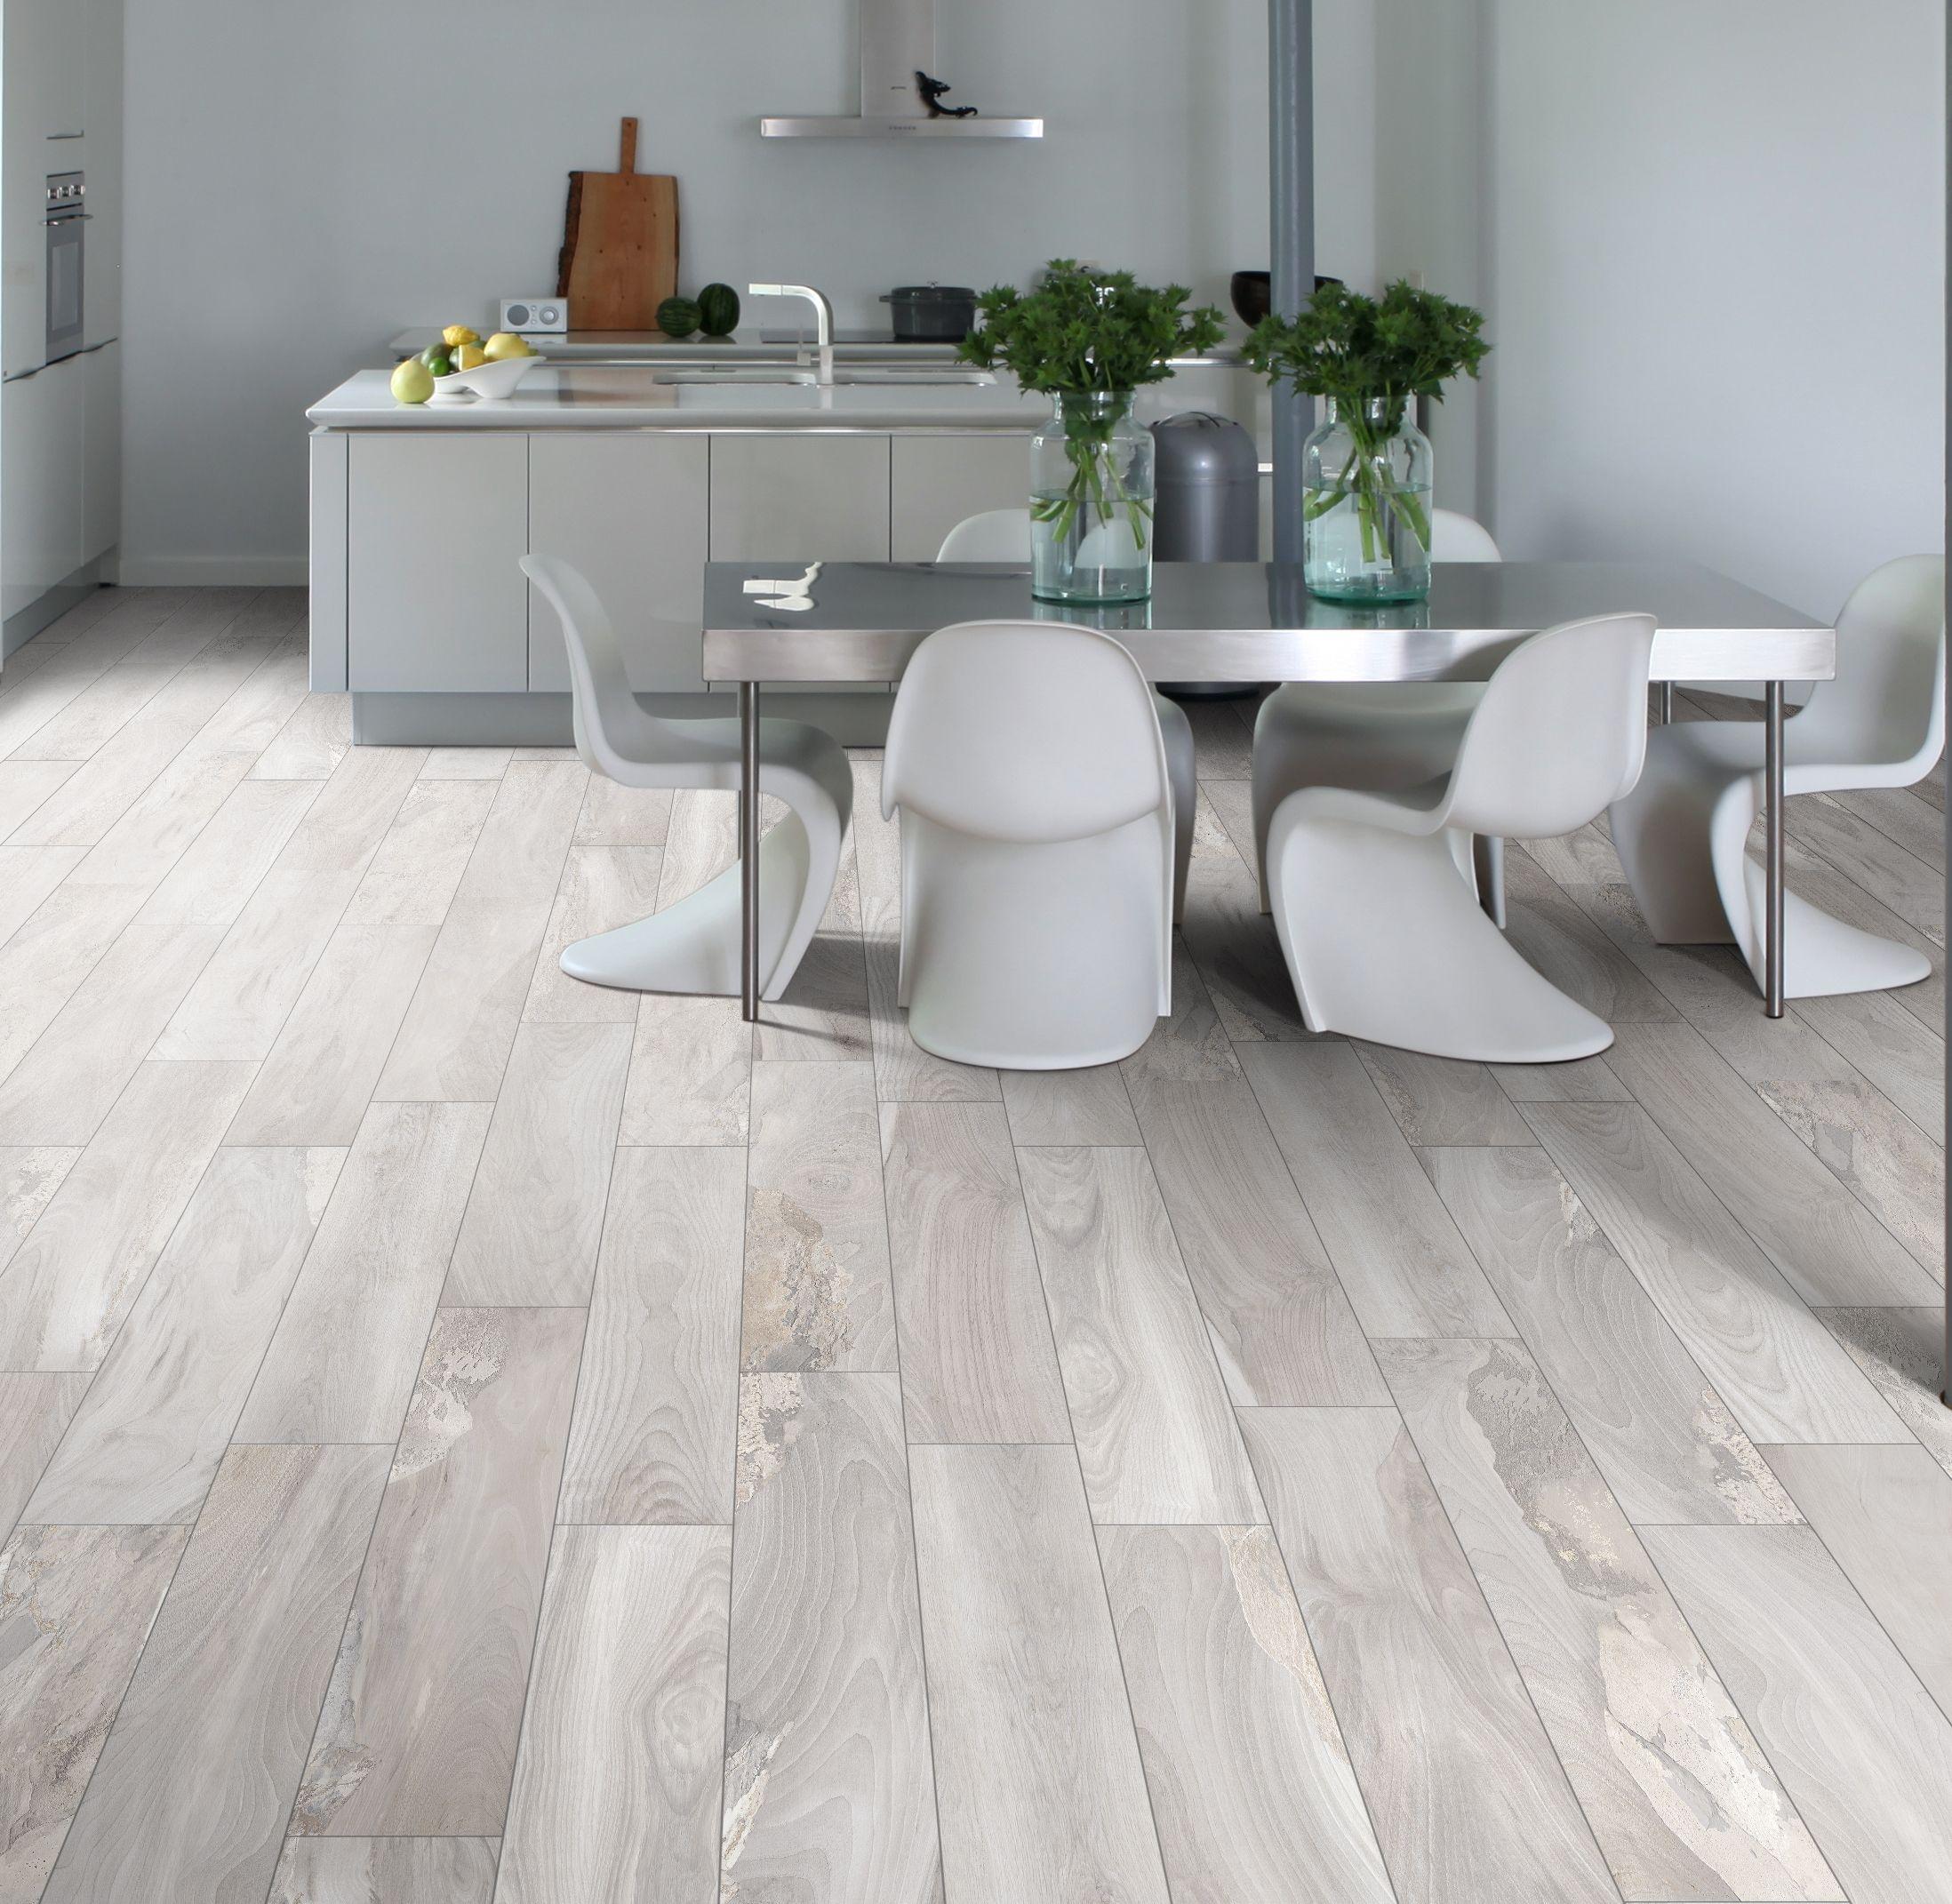 Custom Wood Floor Tile Horizon Italian Floor Tiles Tile Flooring